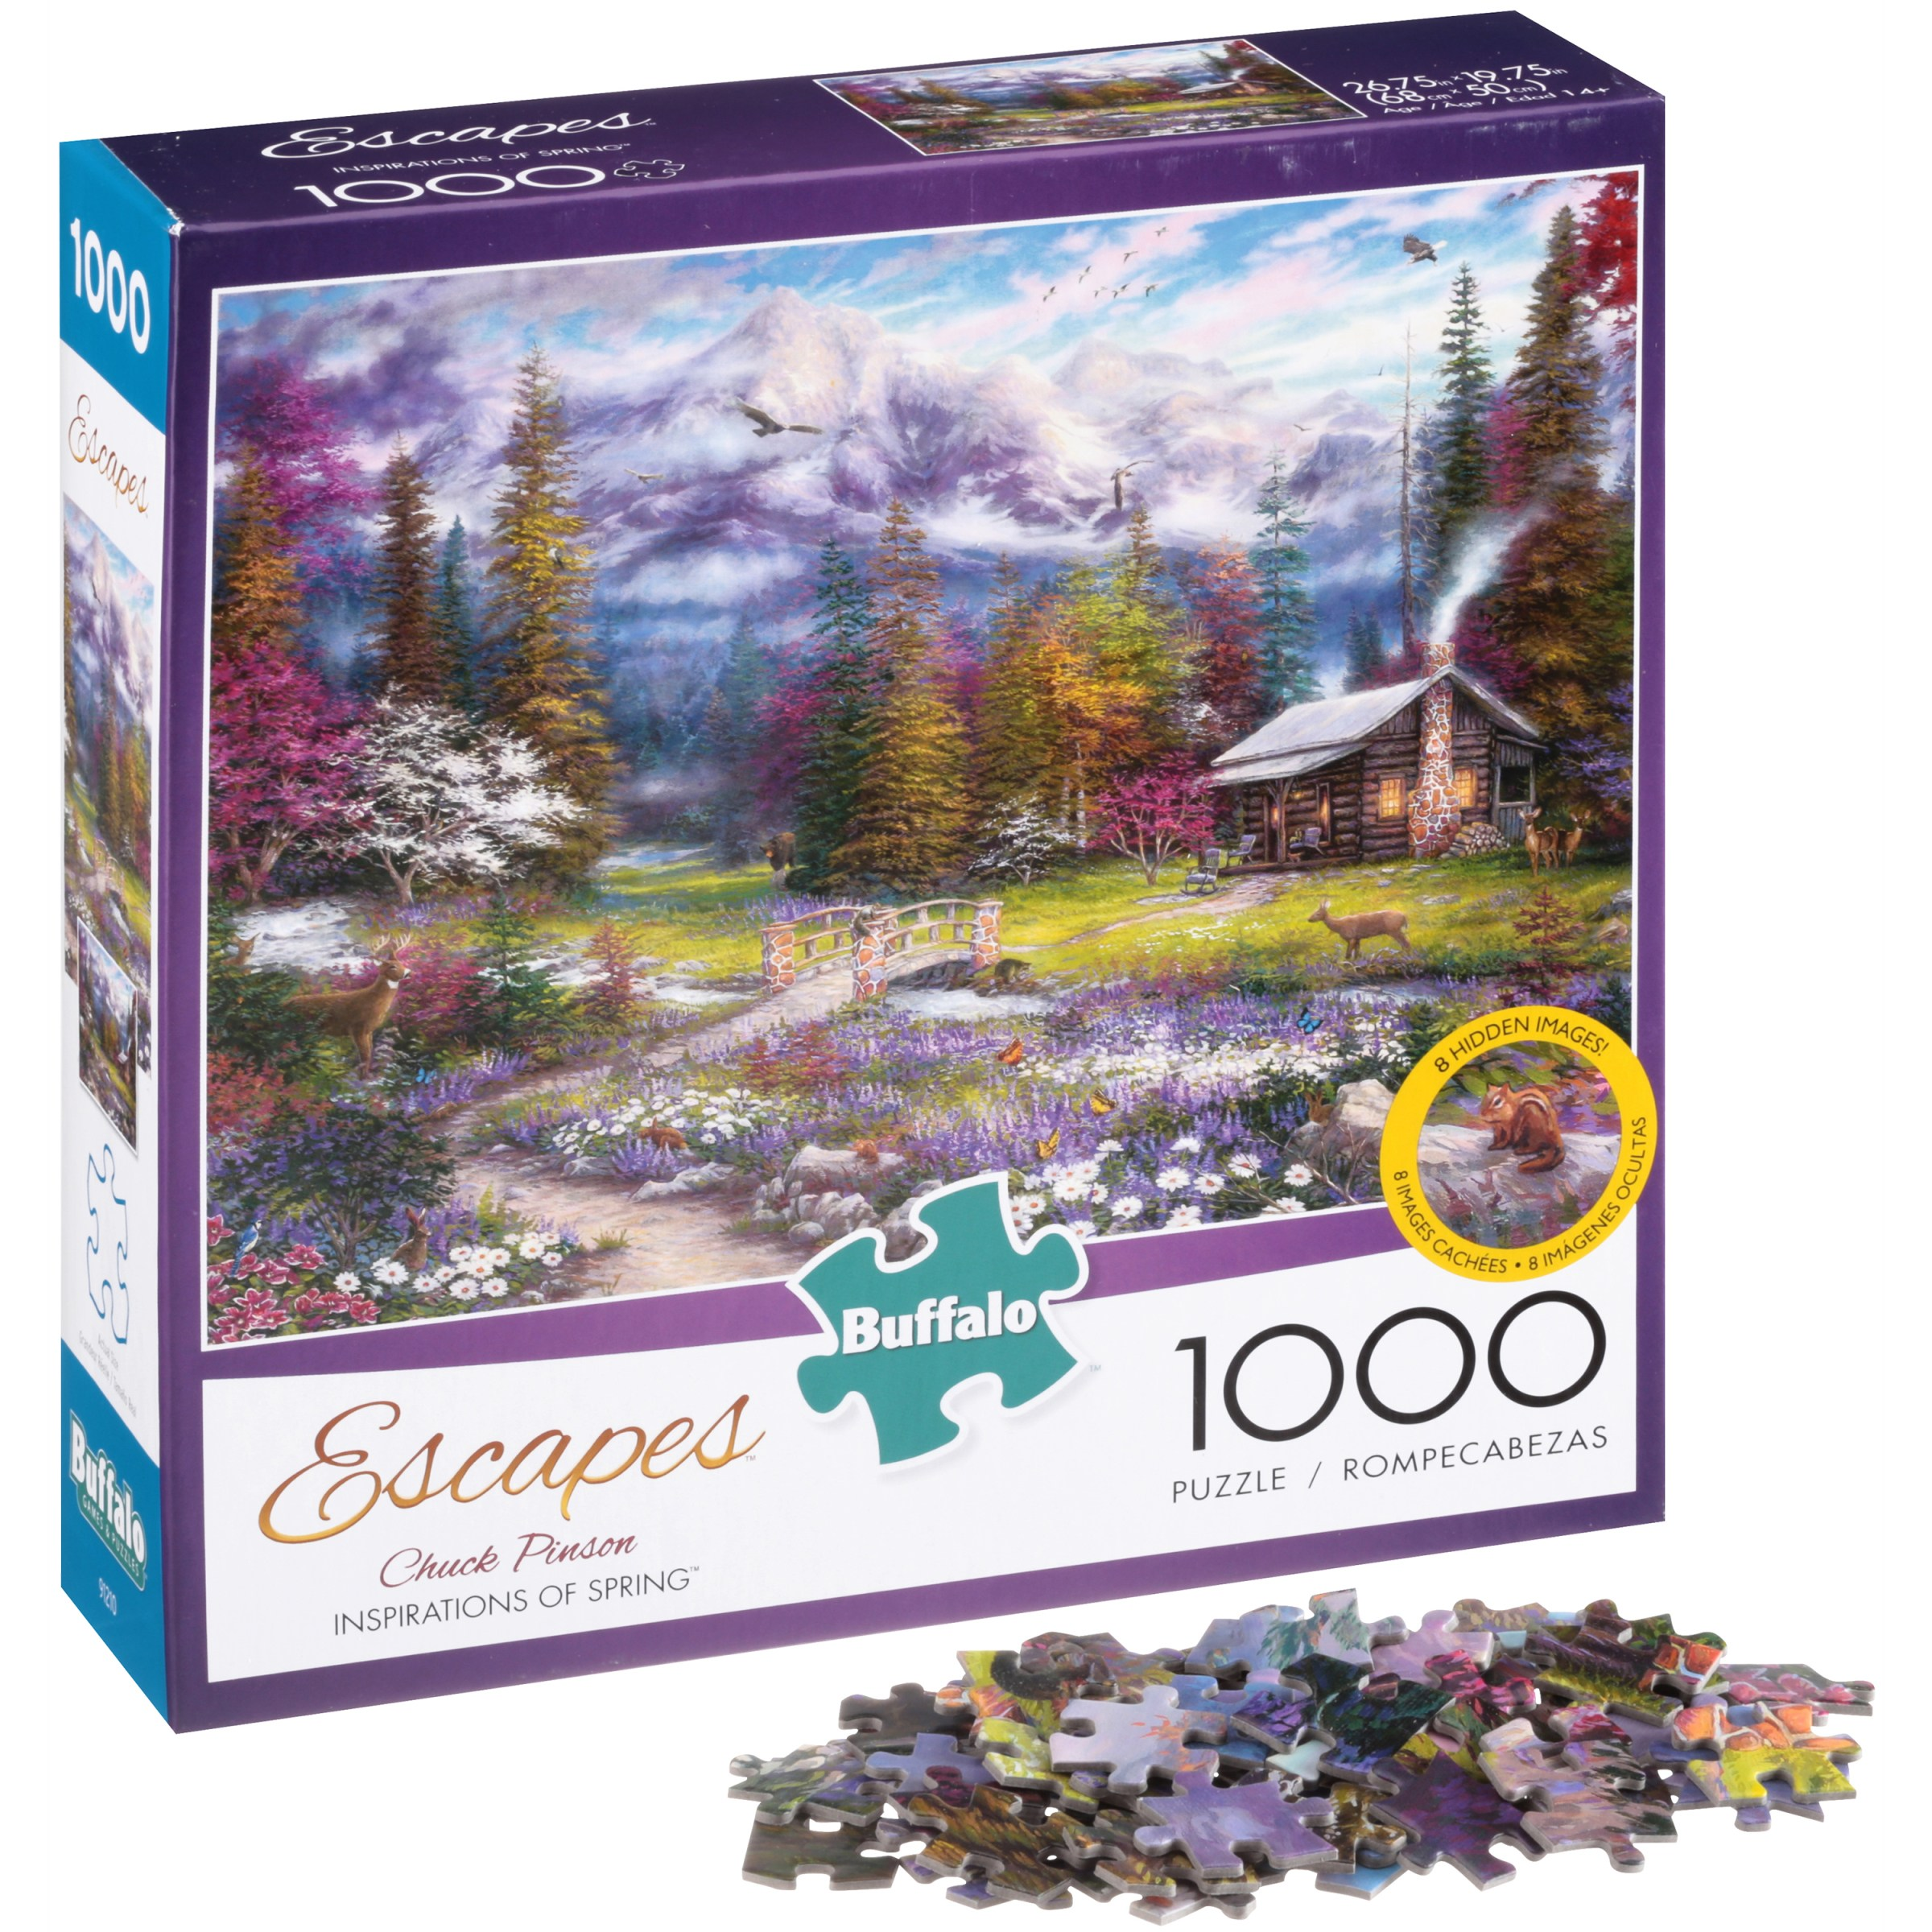 Buffalo Escapes Chuck Pinson Inspirations of Spring Puzzle 1000 pc Box by Buffalo Games, LLC